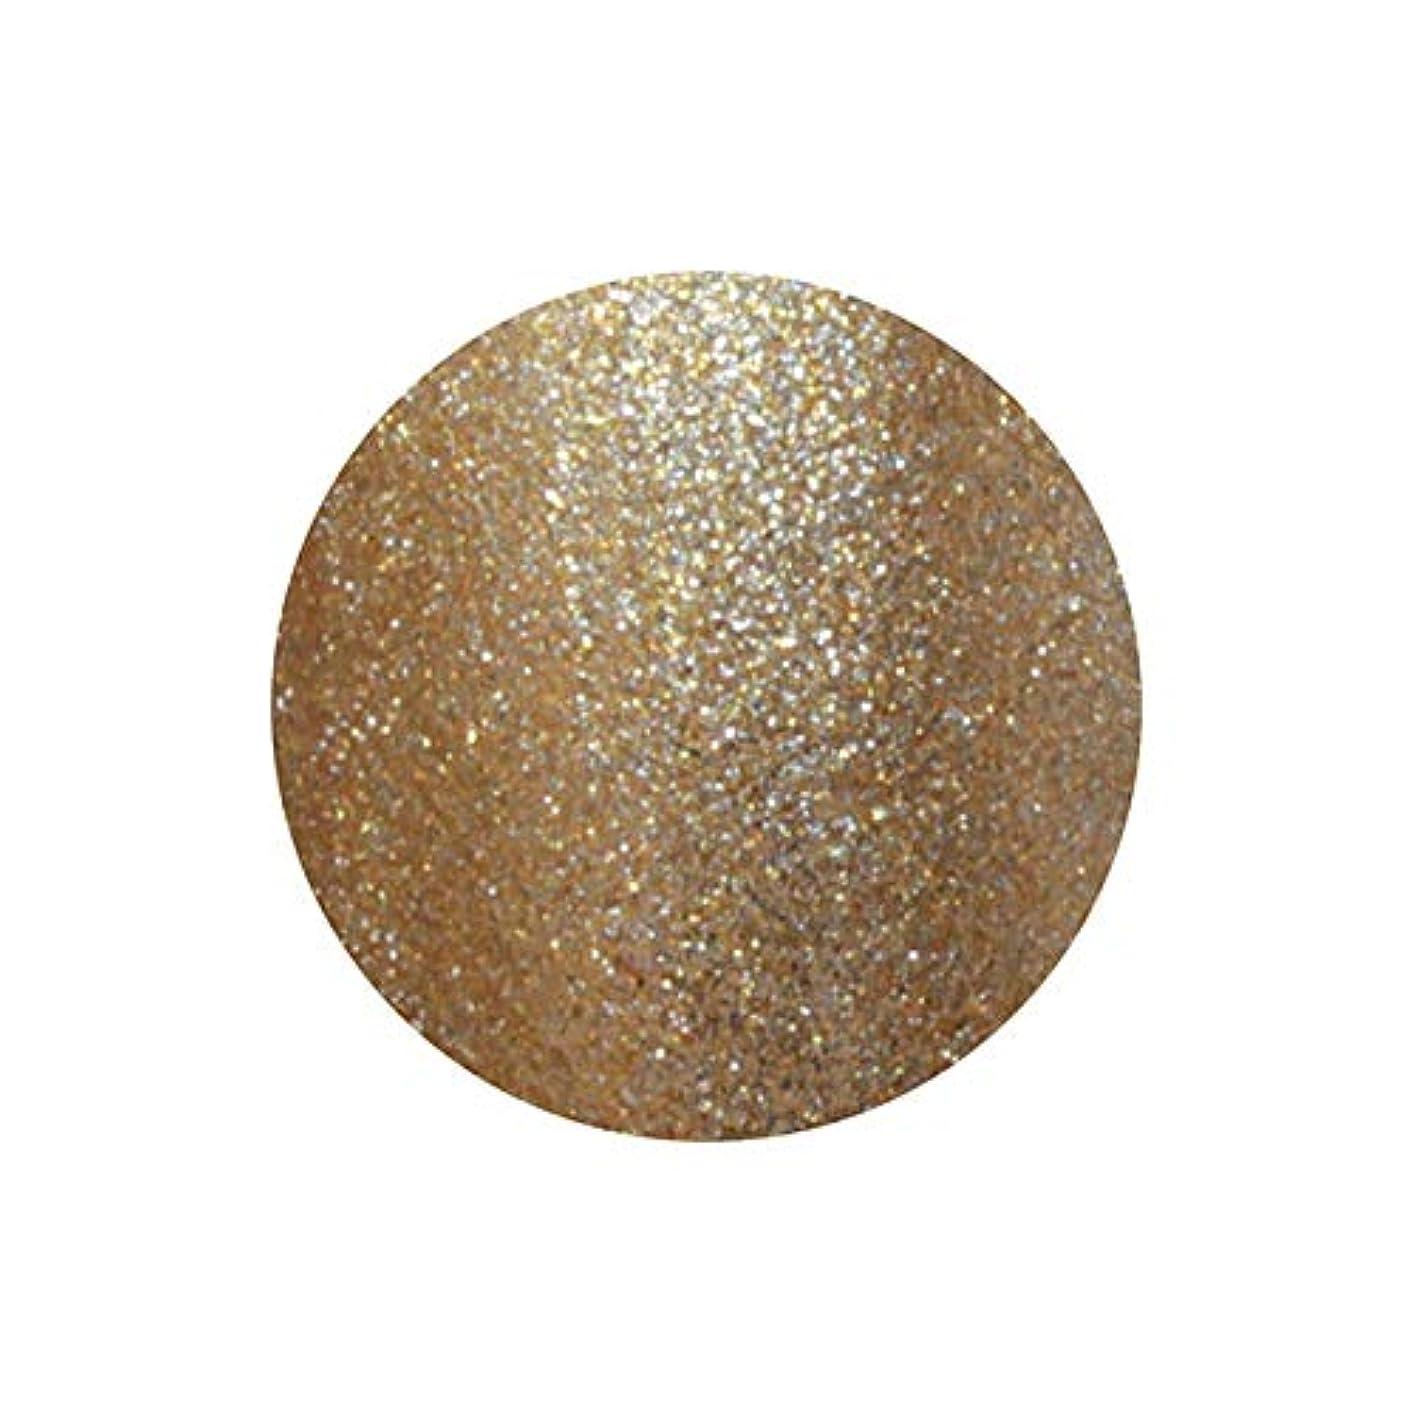 【NEW】T-GEL COLLECTION TINY T001 ゴールド 8ml